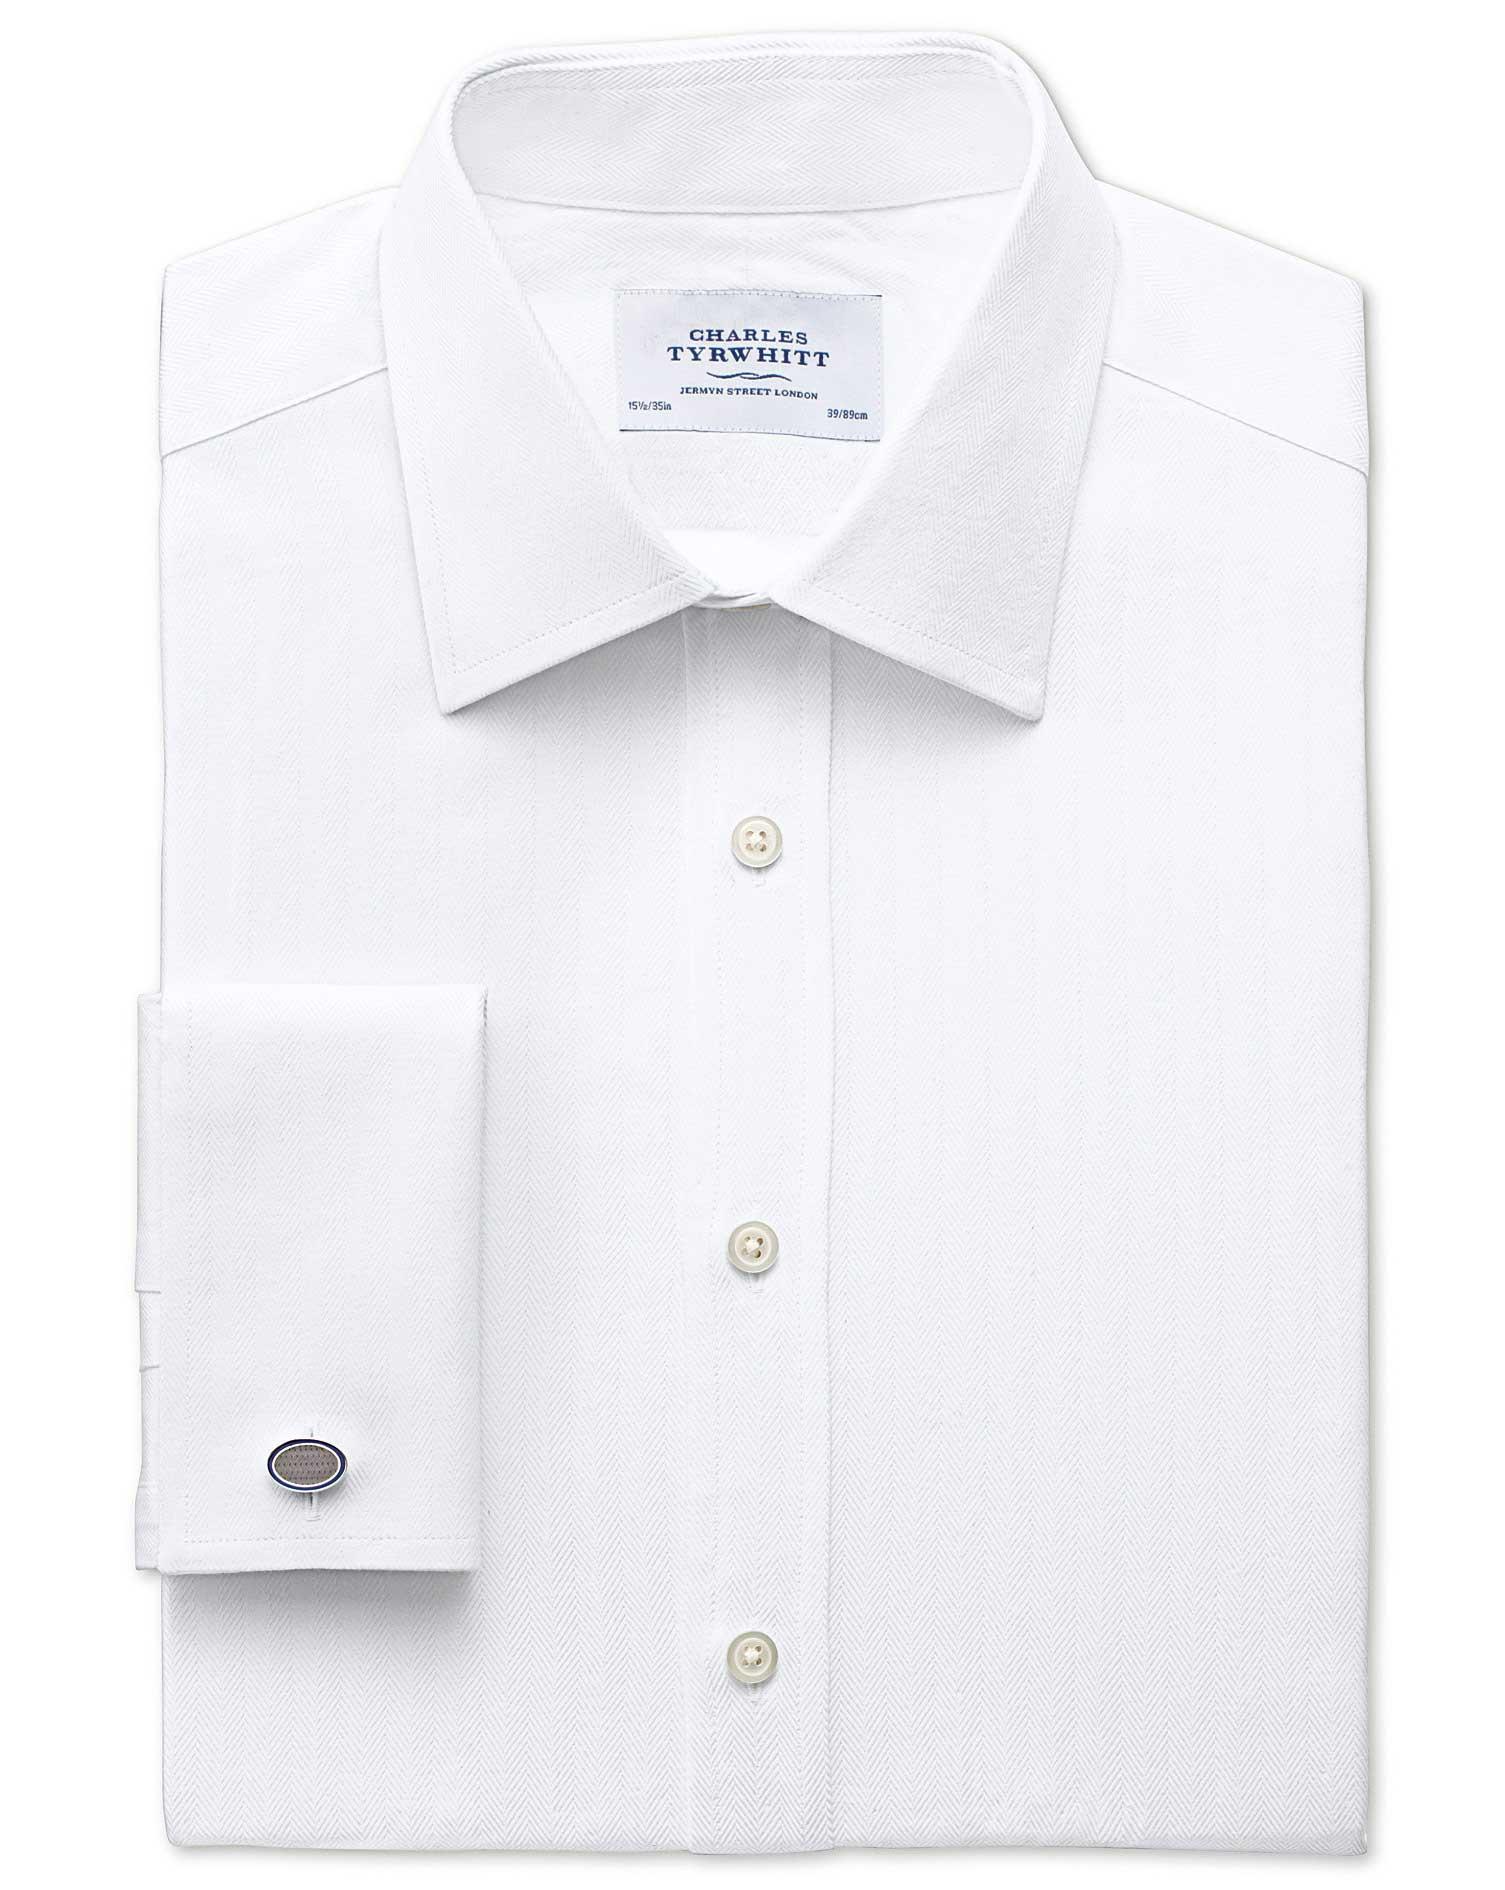 Classic Fit Pima Cotton Herringbone White Formal Shirt Single Cuff Size 15/34 by Charles Tyrwhitt